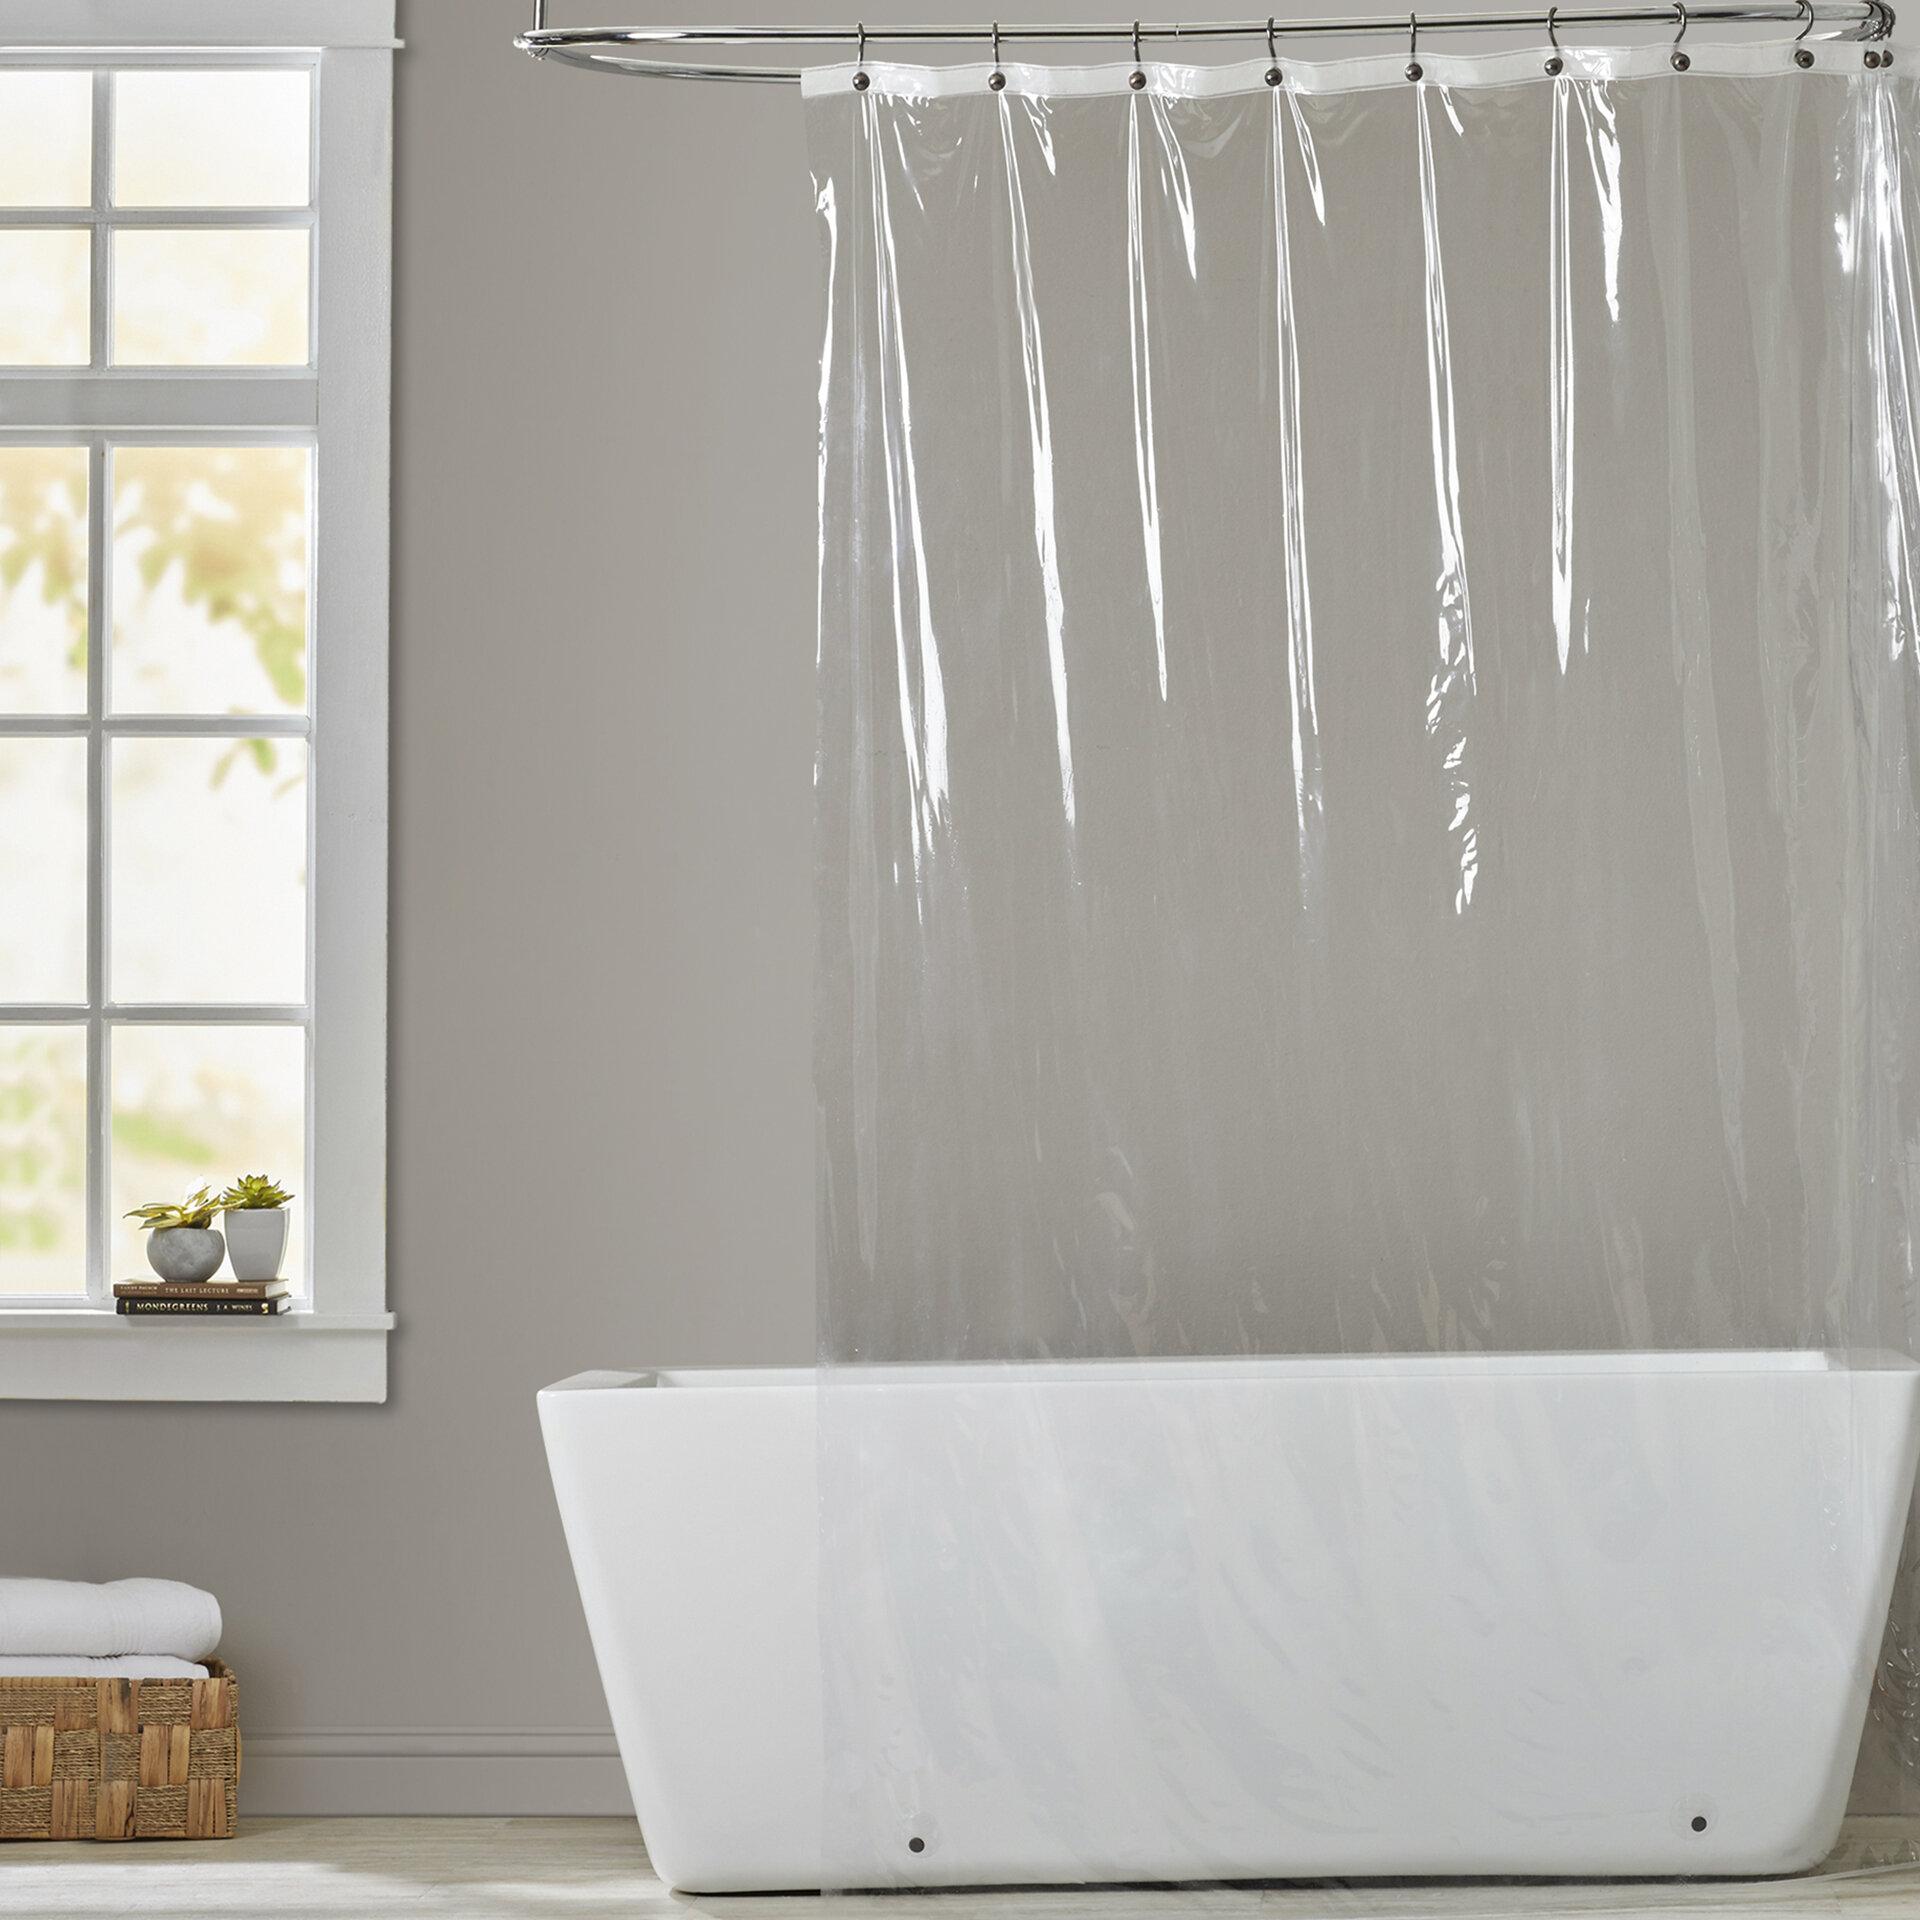 Symple Stuff 5 Gauge Vinyl Shower Curtain Liner Reviews